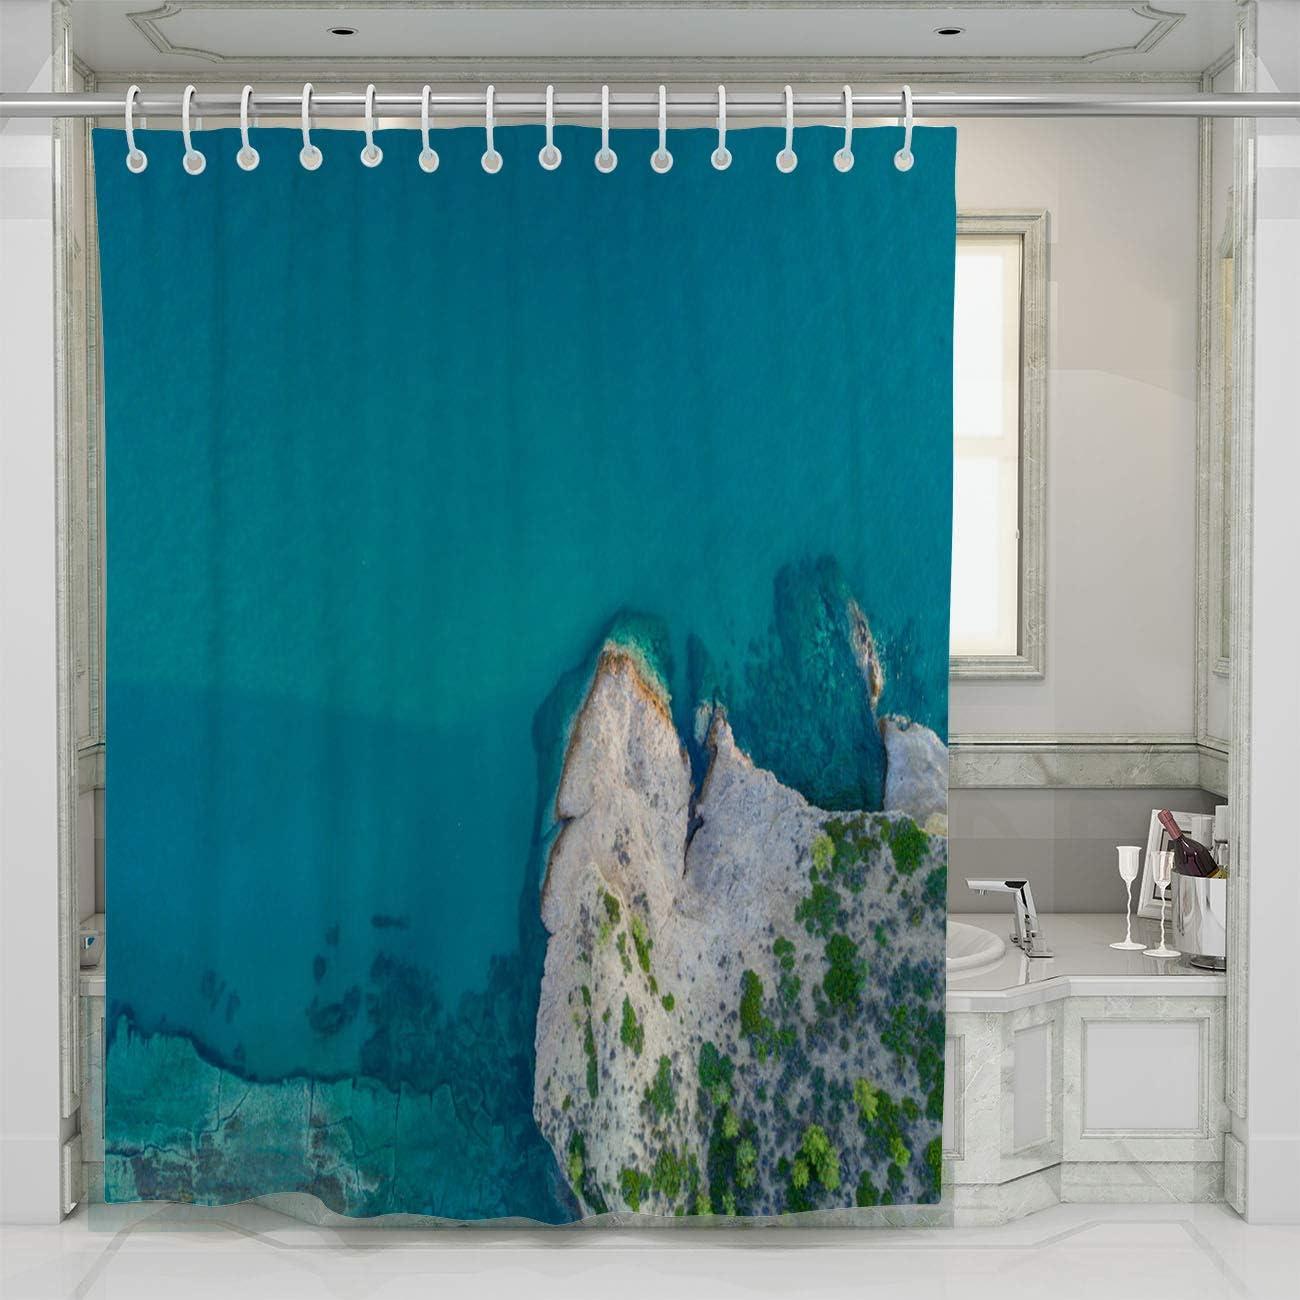 BEISISS Creative Home Bathroom Shower Curtain,Mediterranean Seashore,Shower Curtains for Bathroom Waterproof Fabric with Hooks